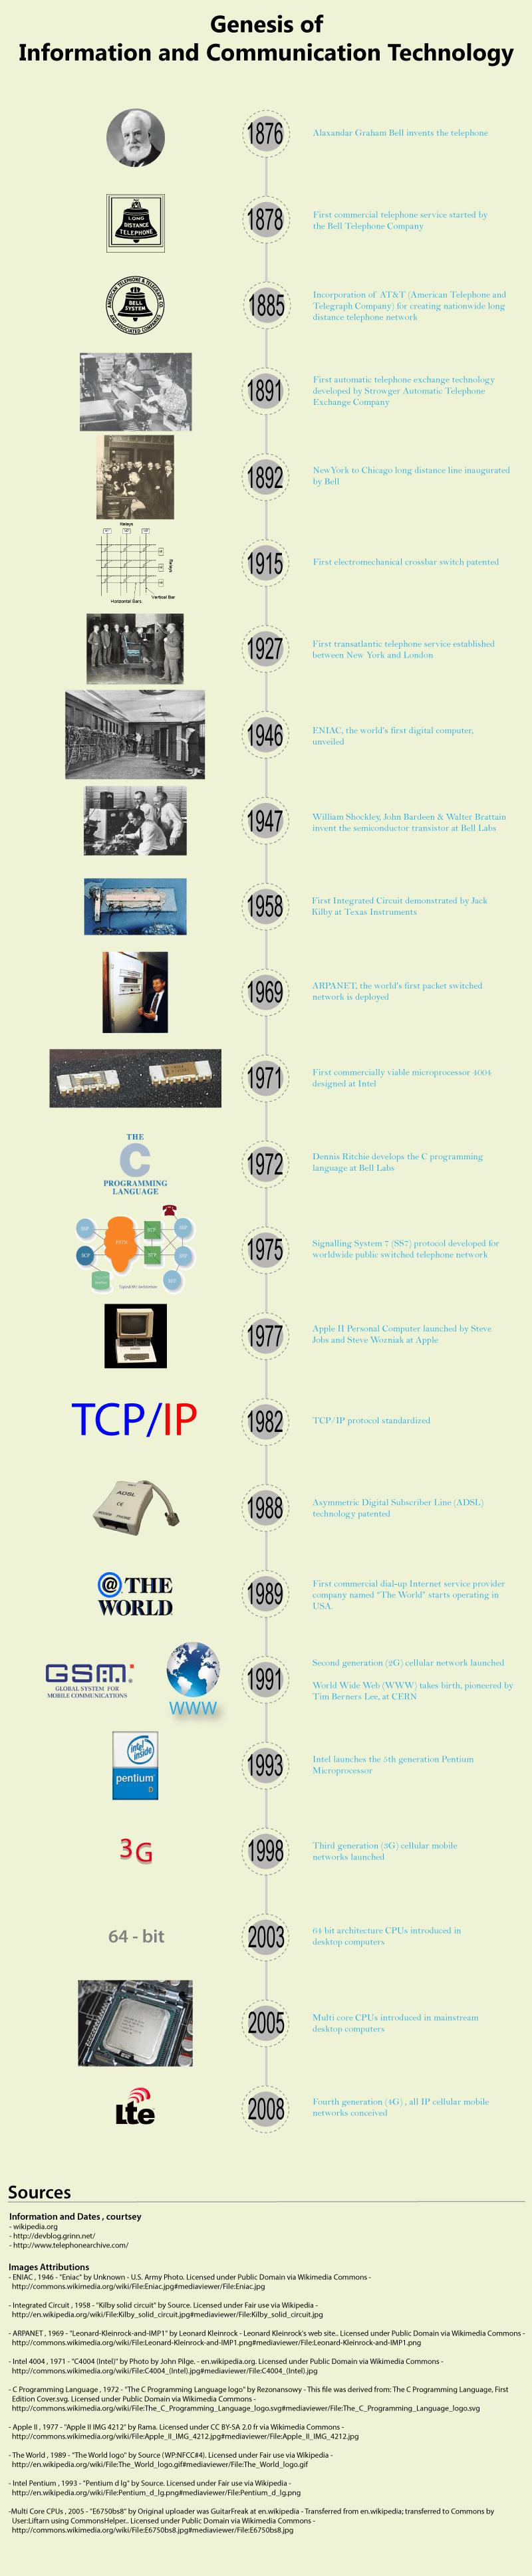 Genesis of ICT